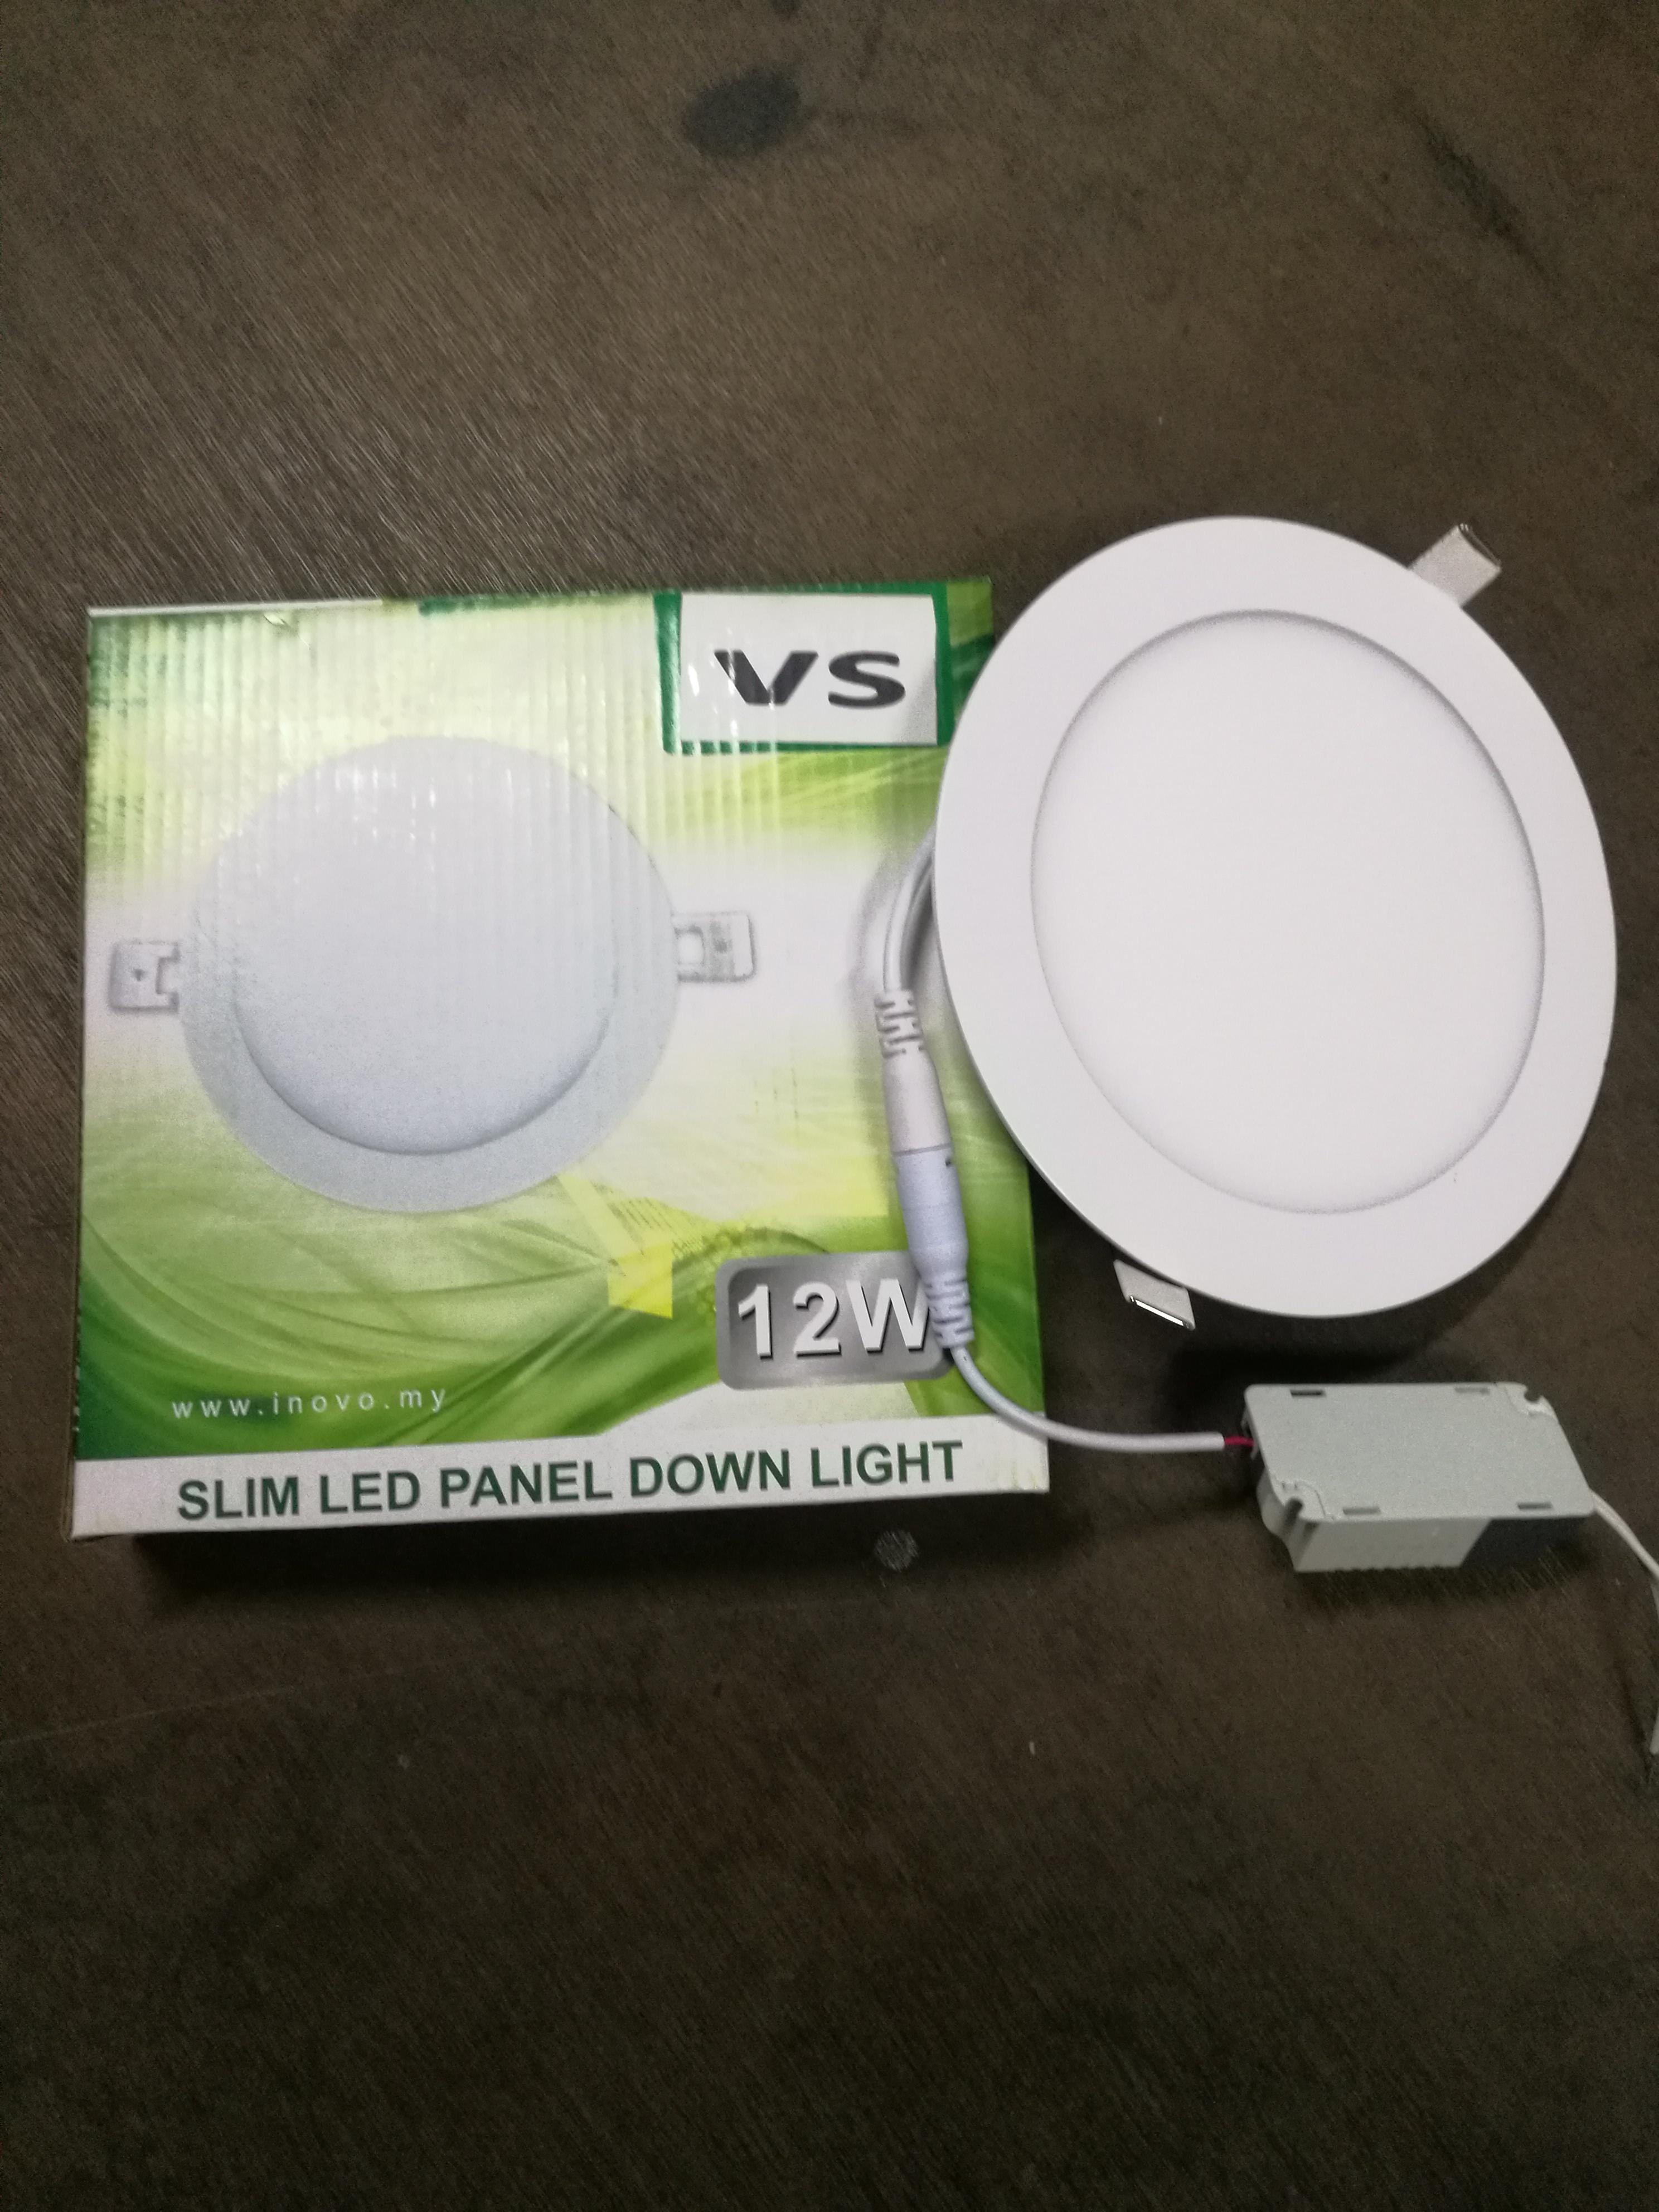 Vs slim led panel downlight 12w